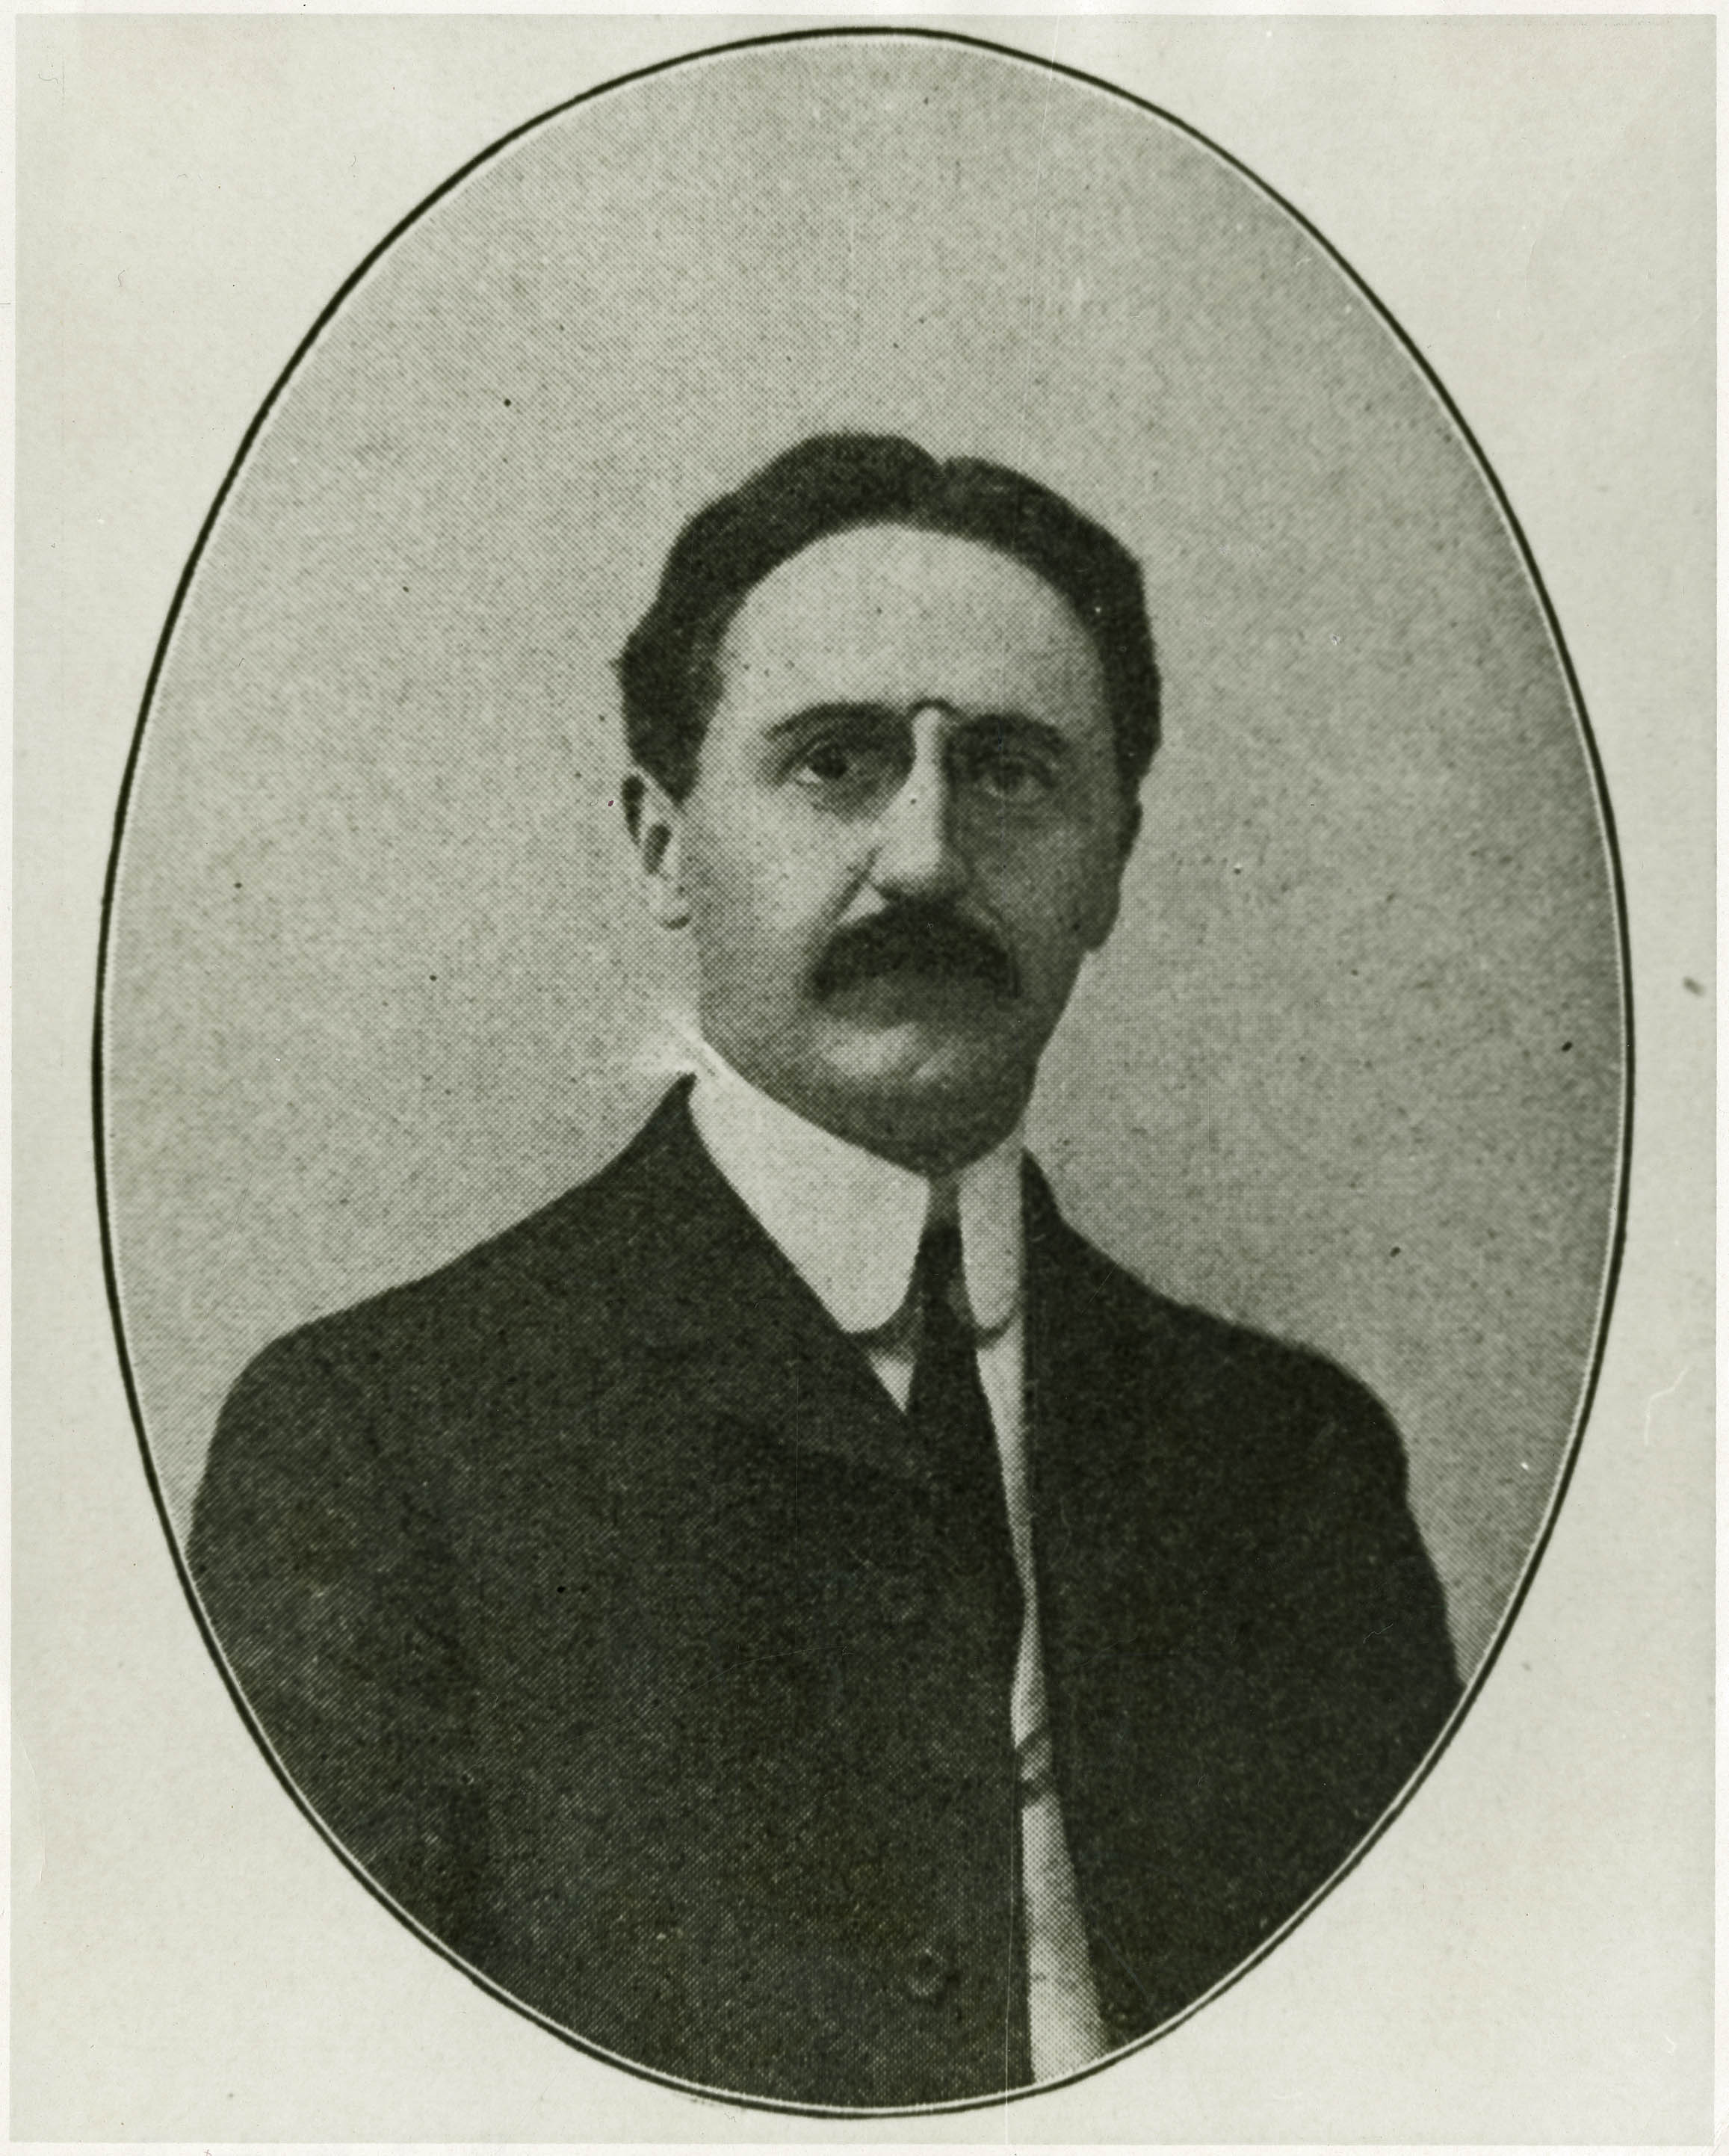 Portrait of Avery Principal Reverend T. Newton Owen